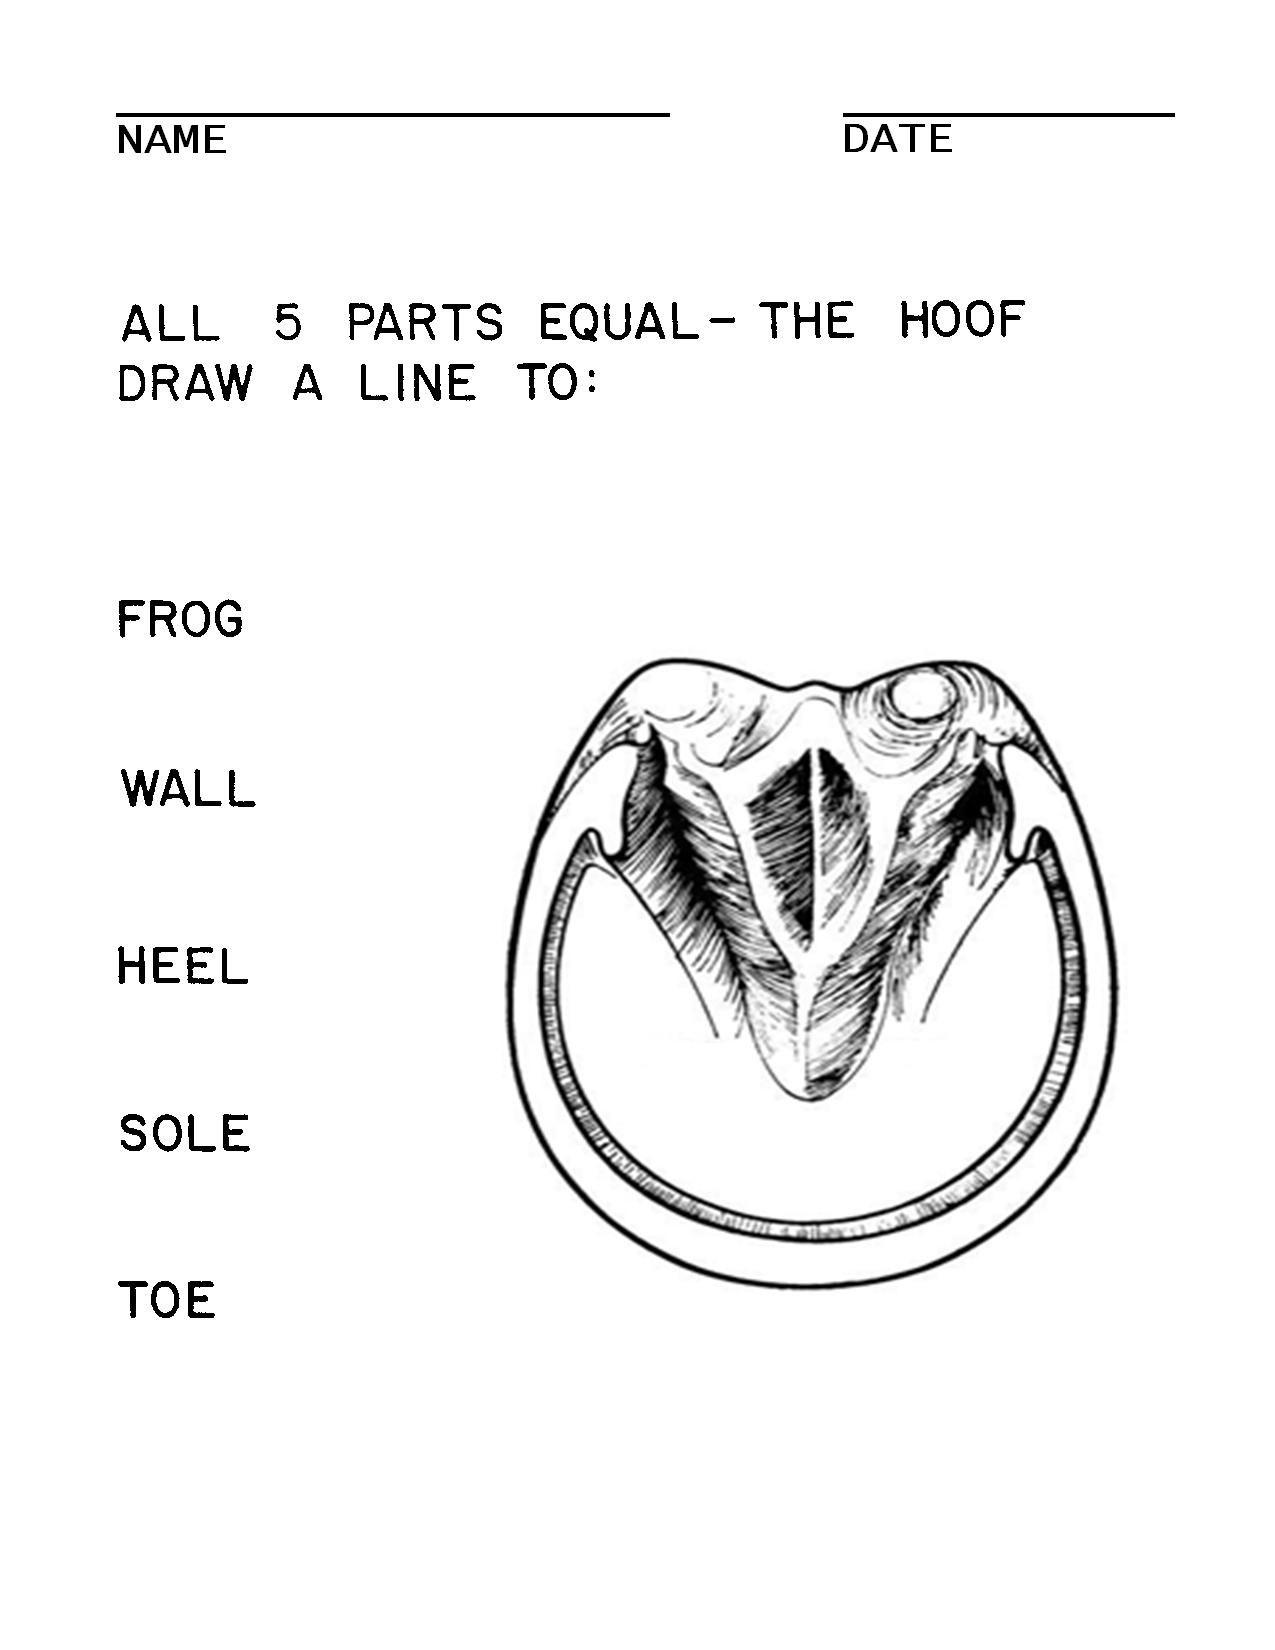 Equine Hoof Diagram No Labels - DIY Wiring Diagrams •